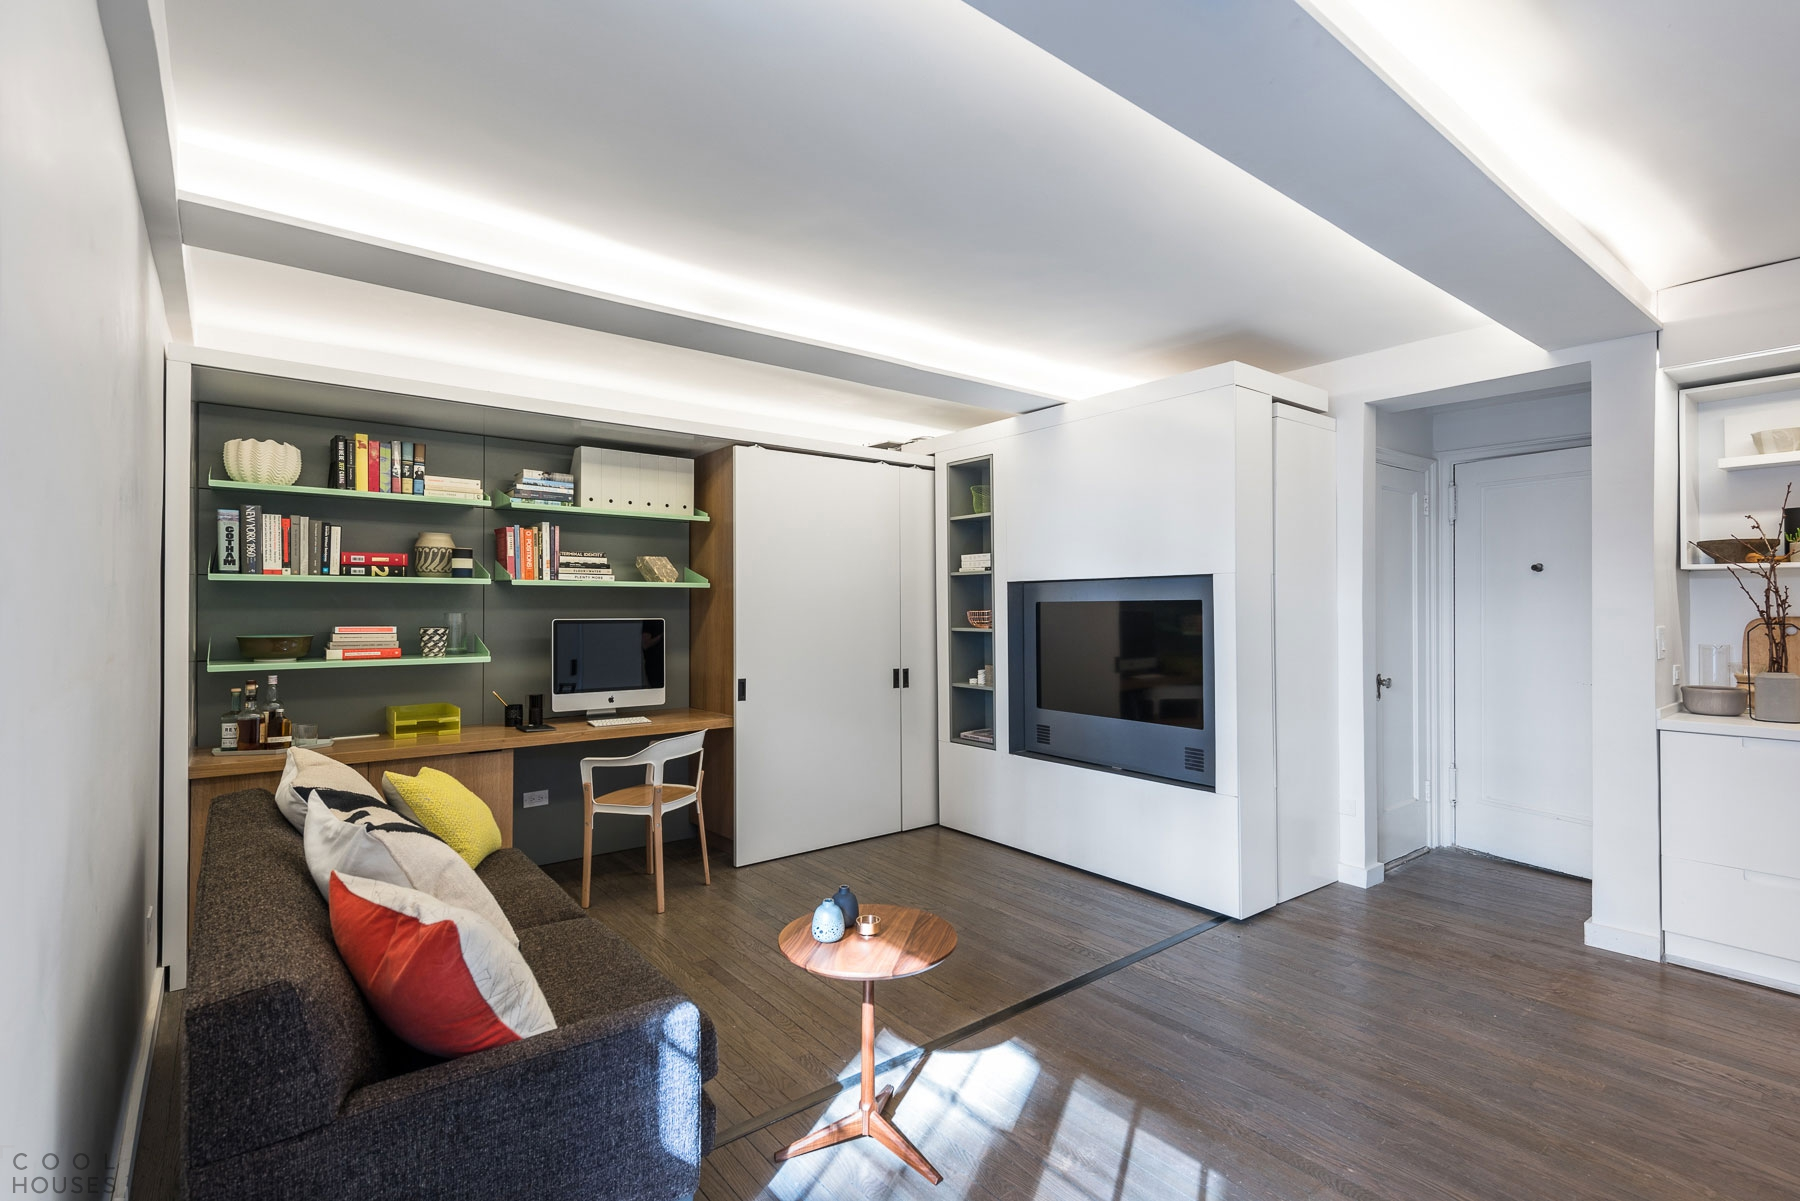 6 ciri desain interior apartemen minimalis idaman milenial